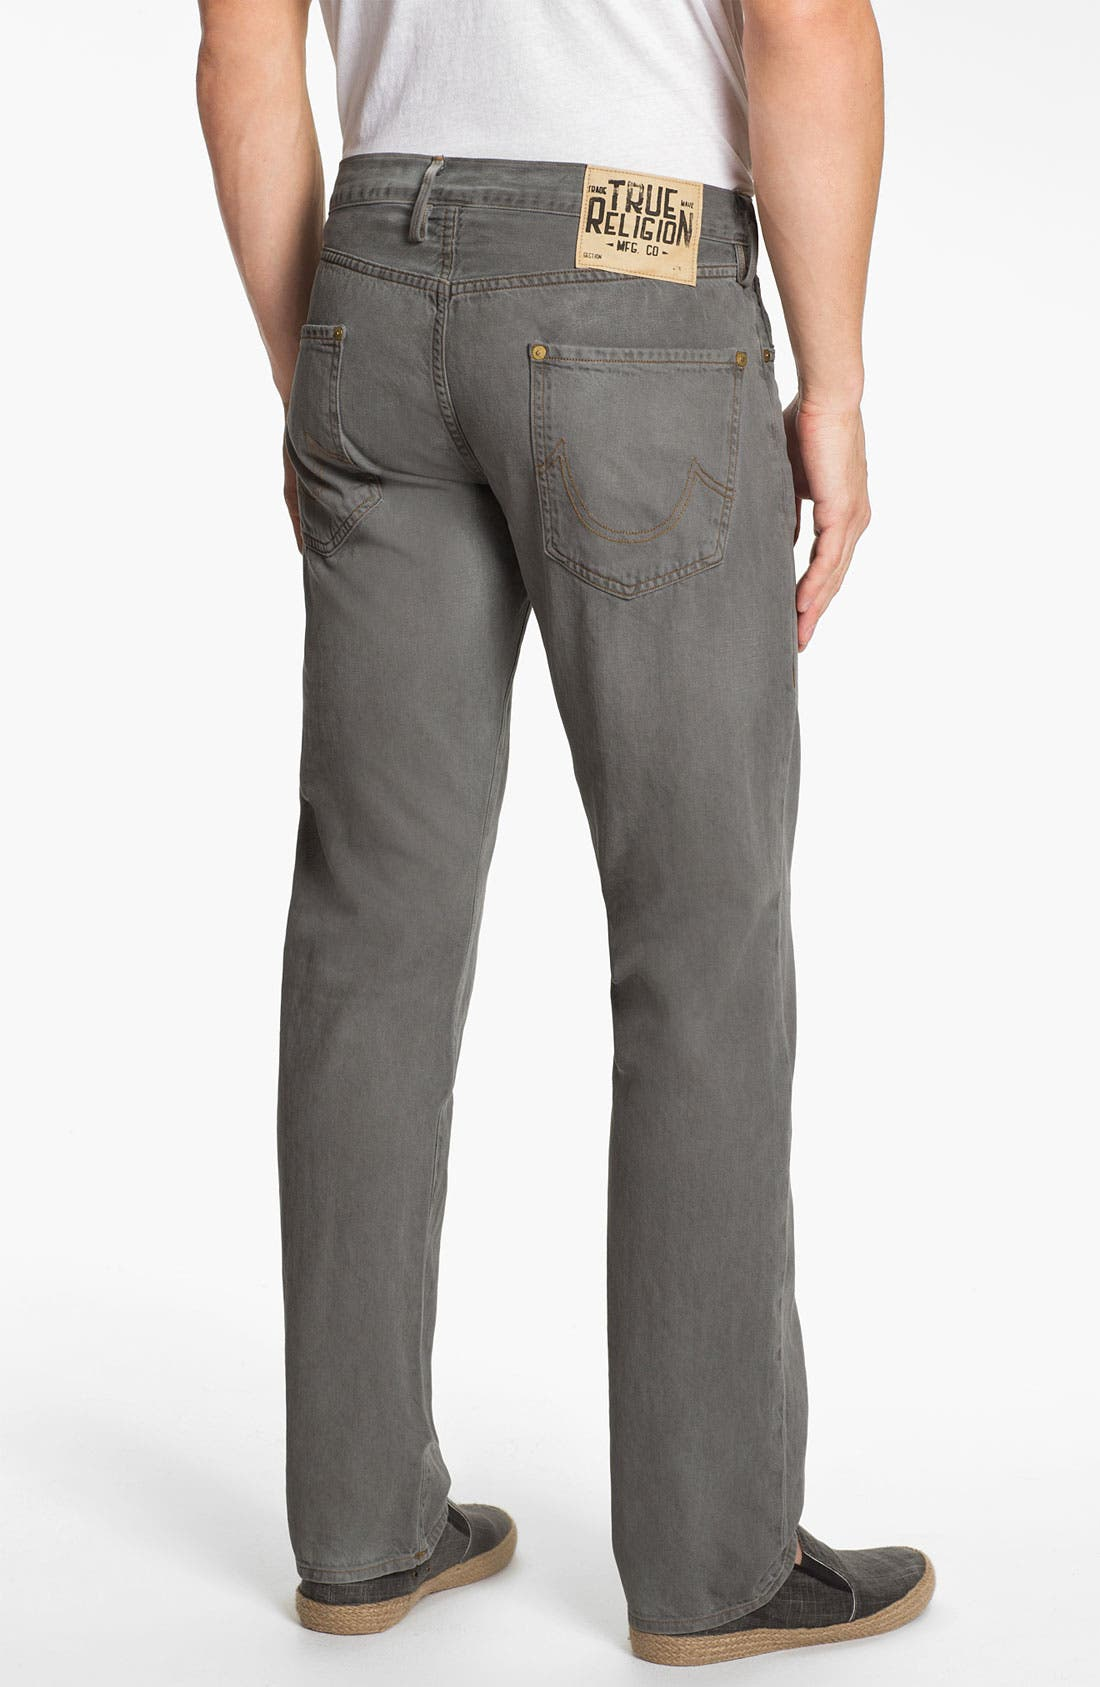 Alternate Image 1 Selected - True Religion Brand Jeans 'Geno Blue Collar Crossroads' Slim Straight Leg Jeans (Smoke Stack)